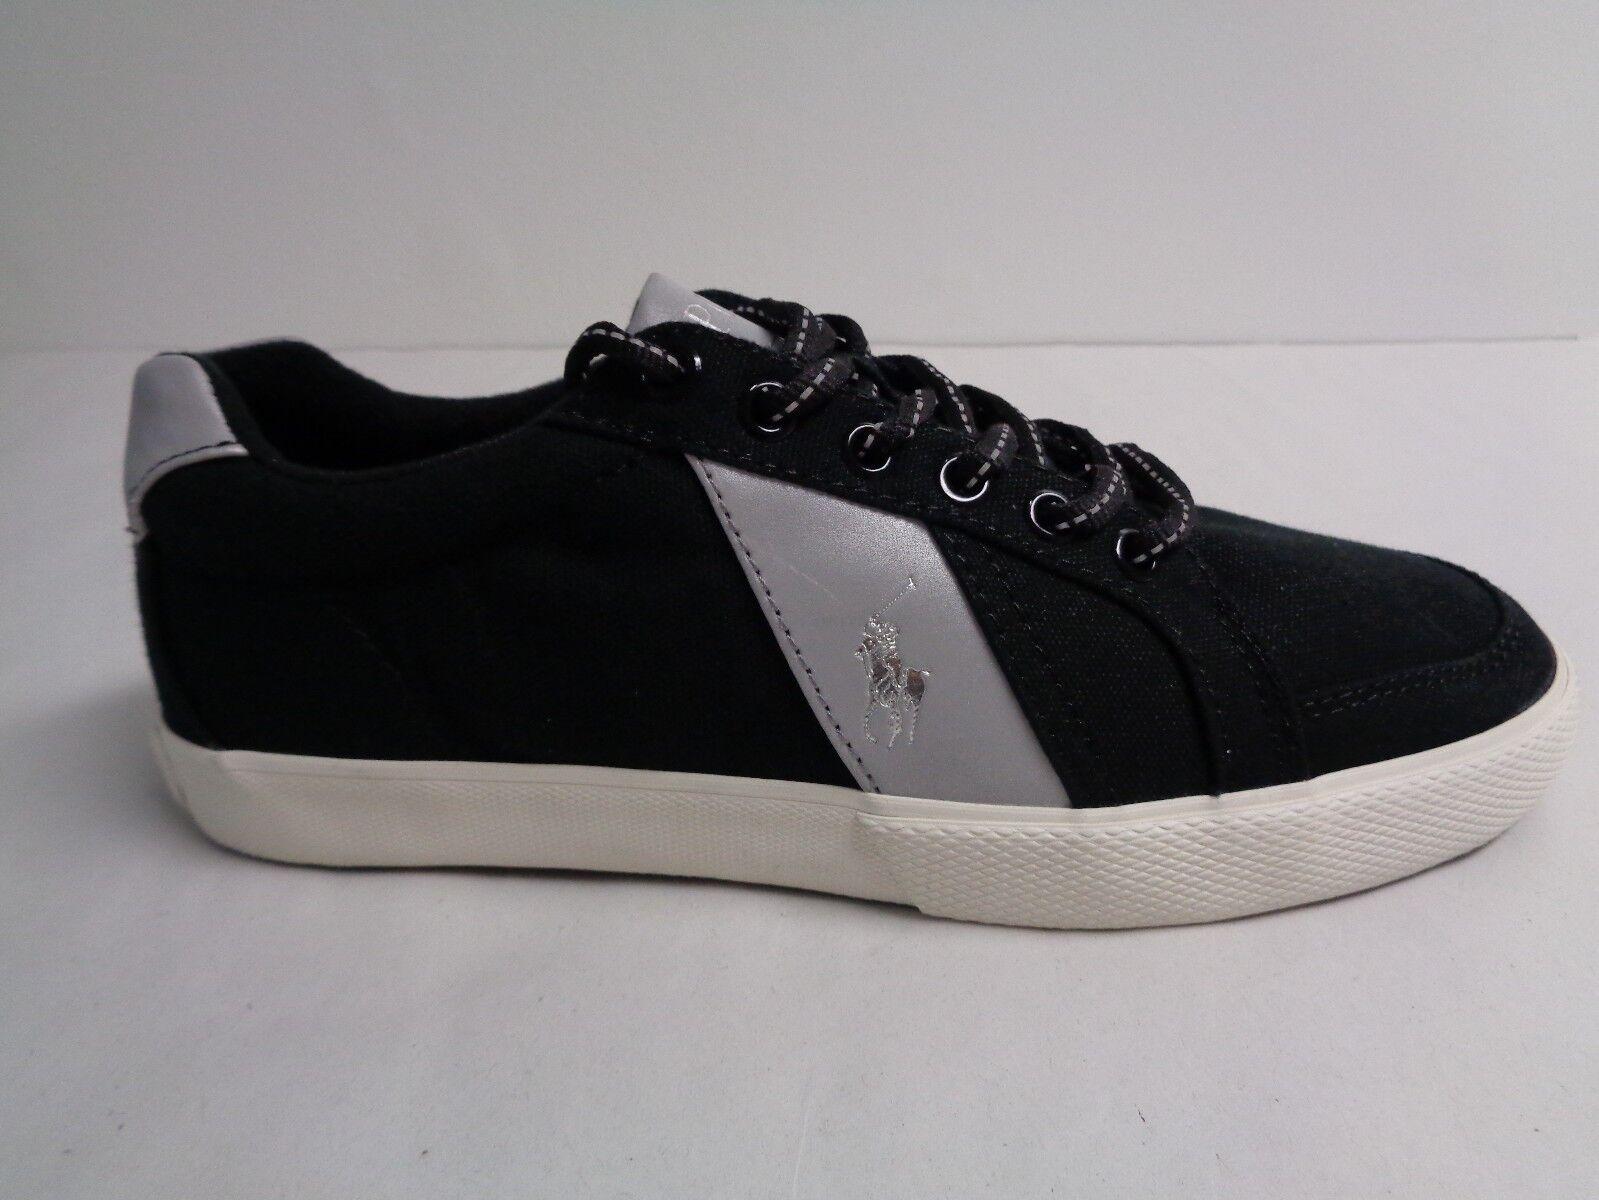 Polo Ralph Lauren Size 11.5 M HUGH Black Canvas Fashion Sneakers New Mens Shoes